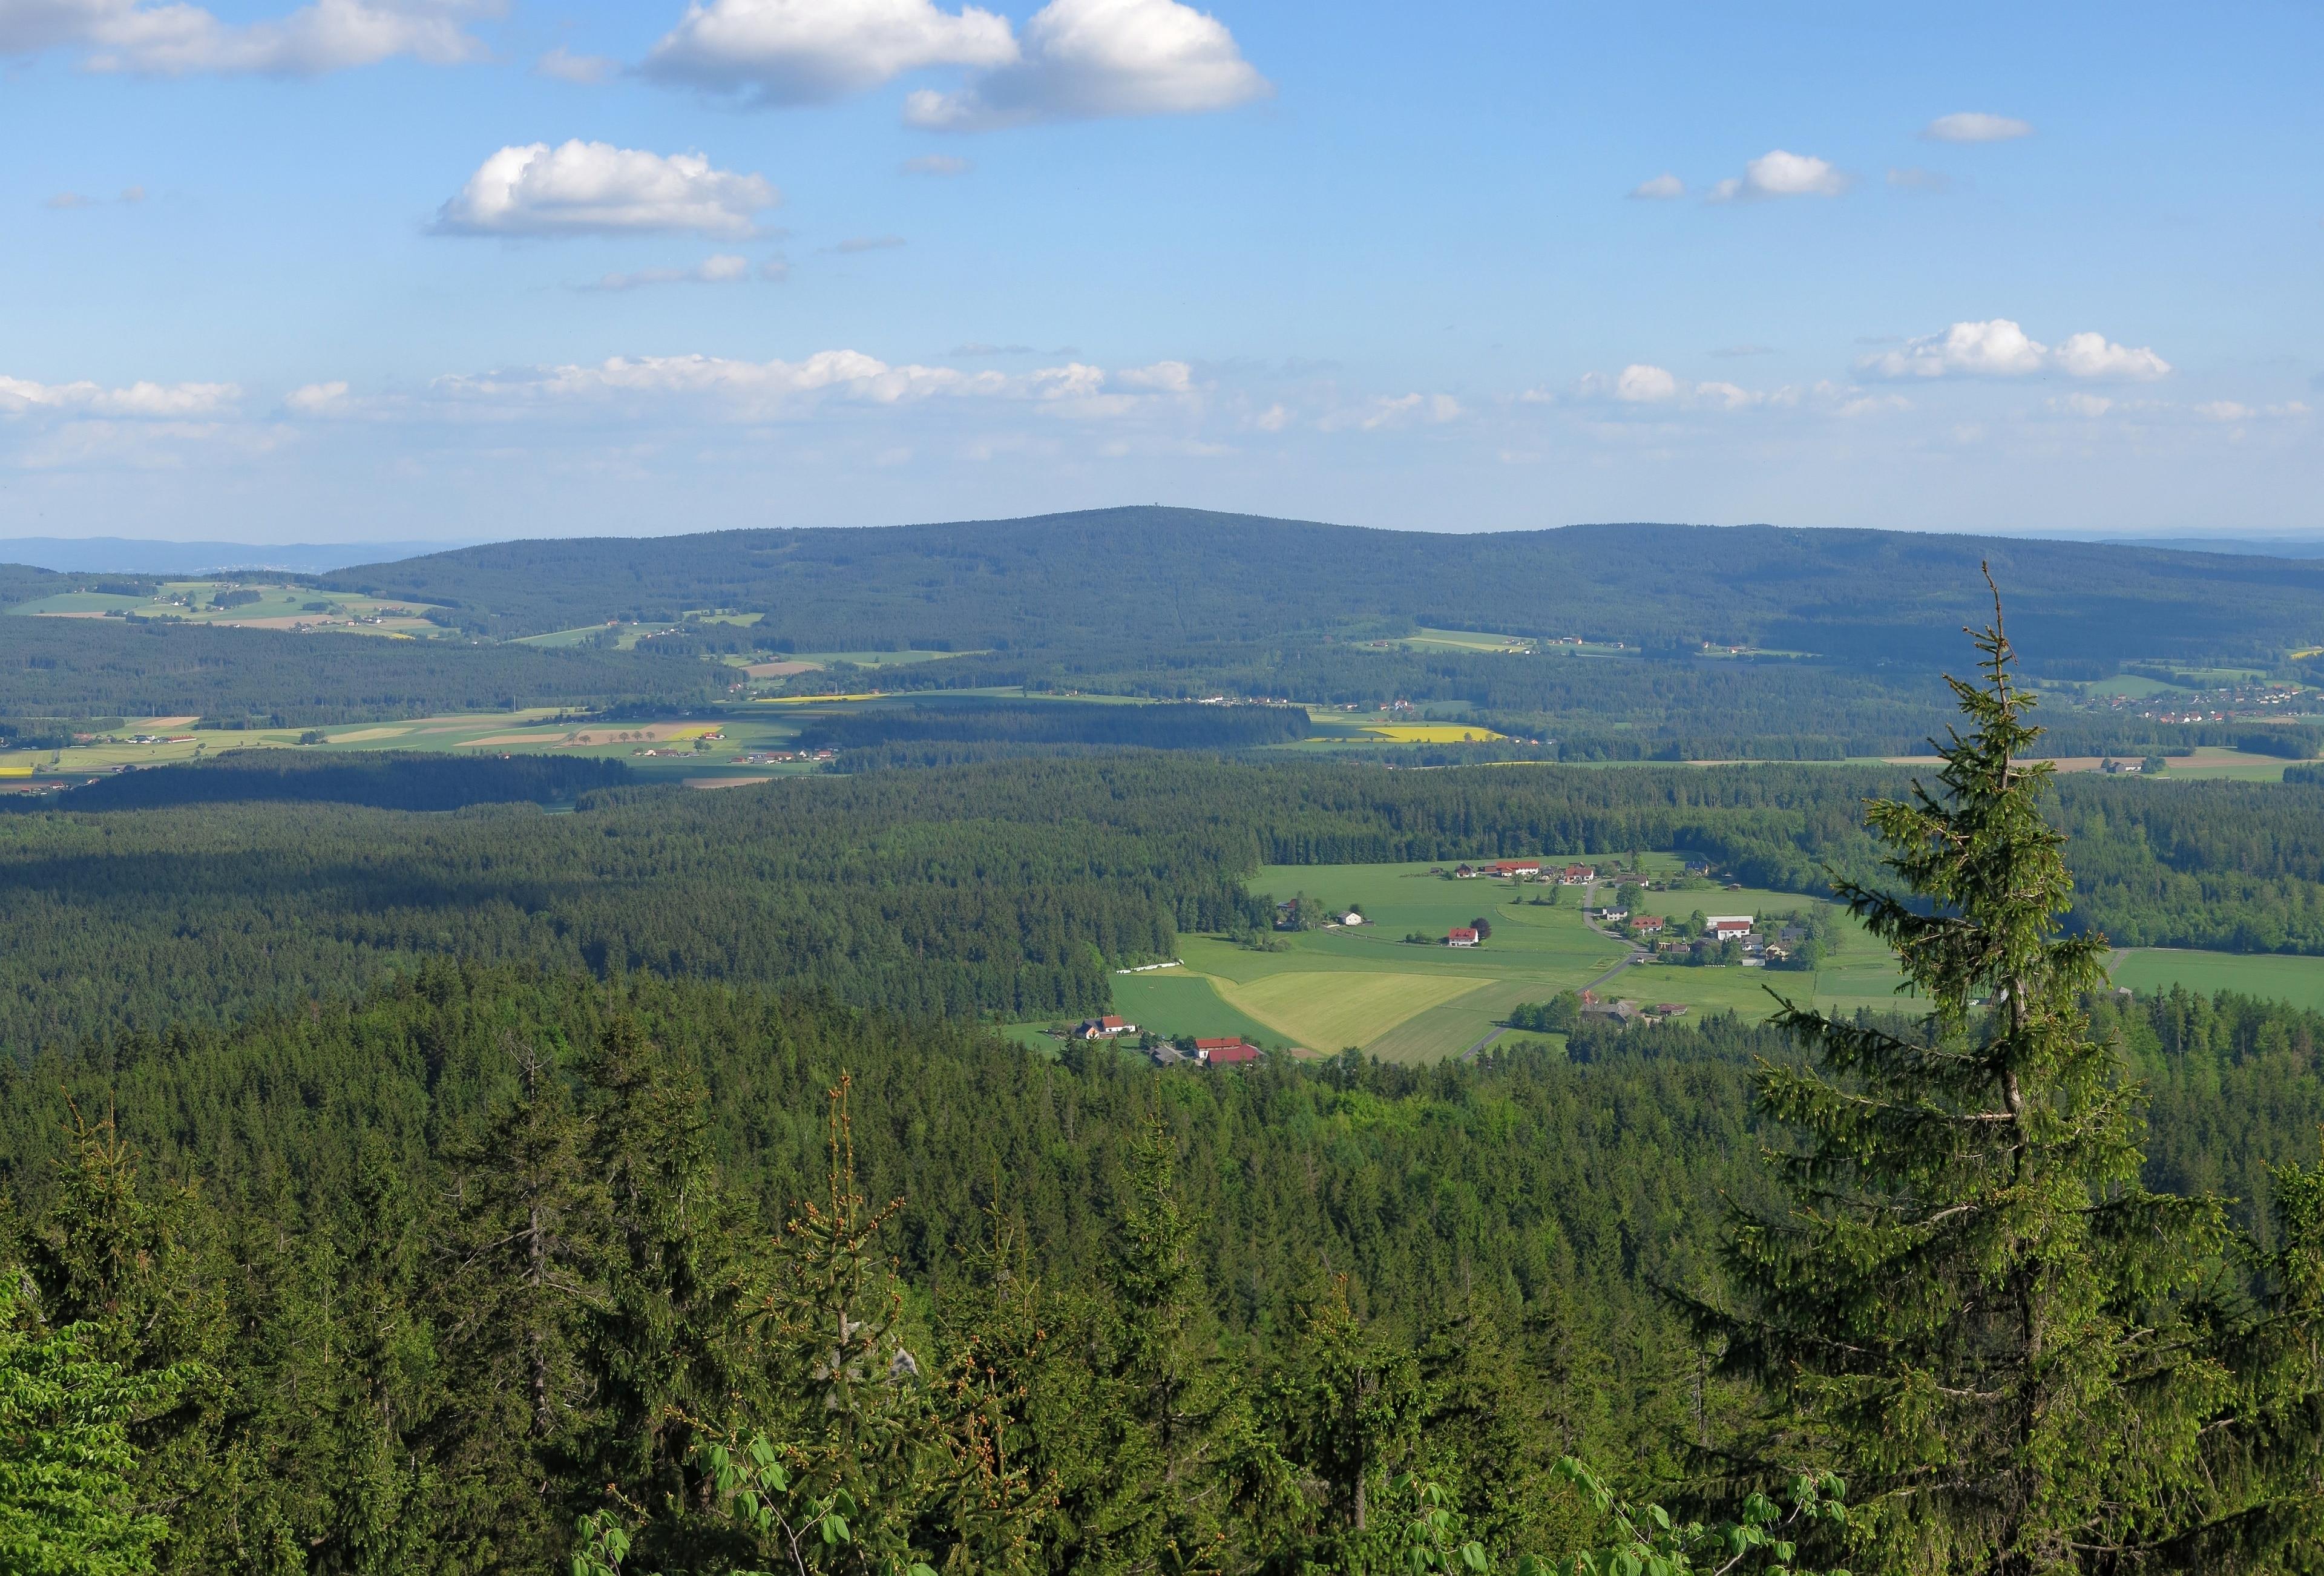 Landkreis Wunsiedel, Beieren, Duitsland